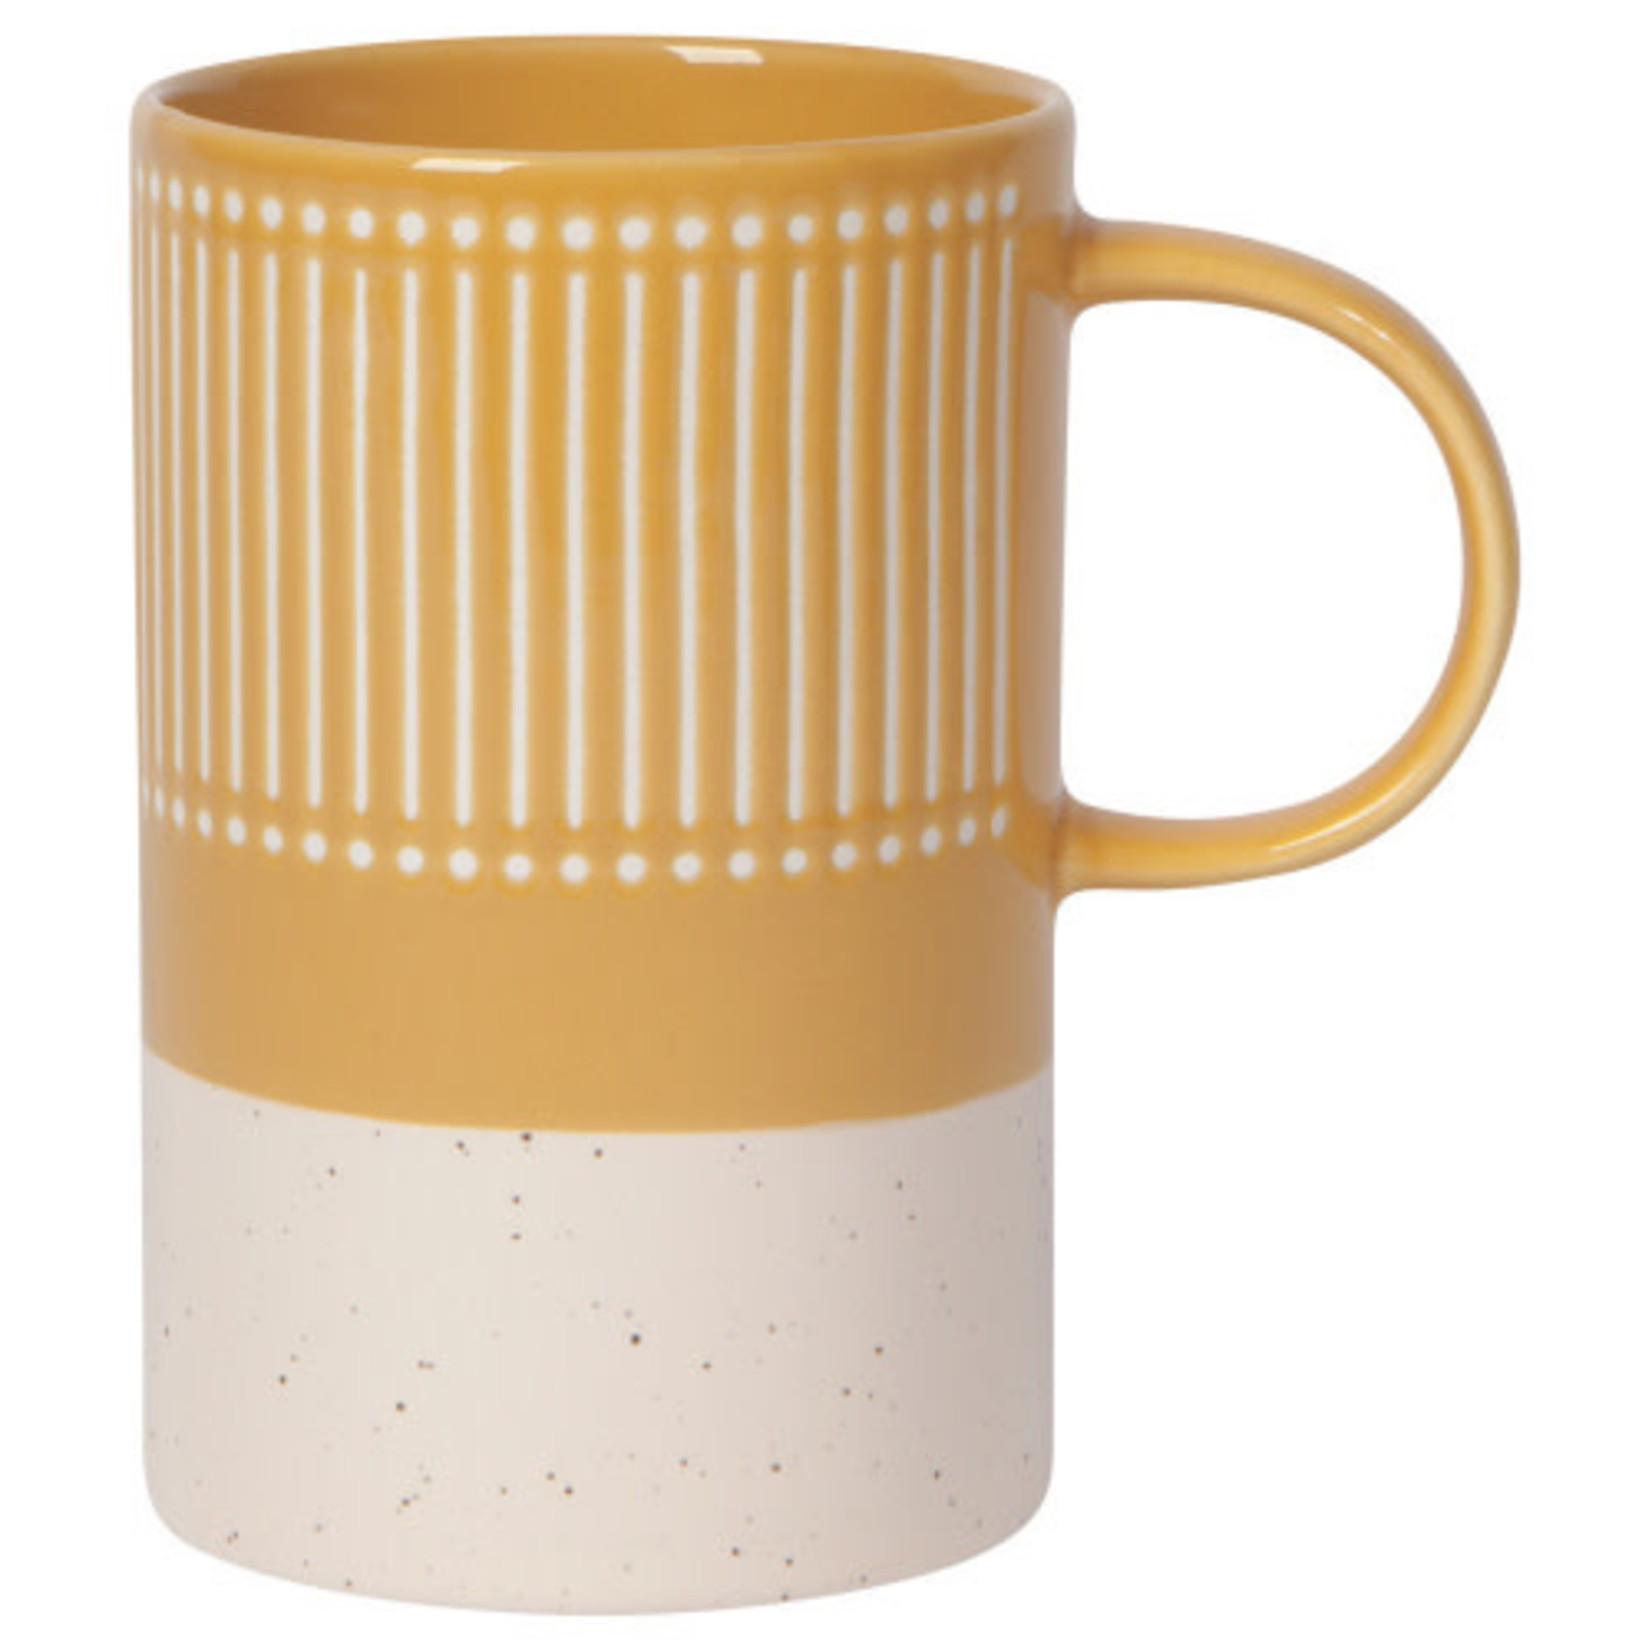 Danica Etch Mug Ochre